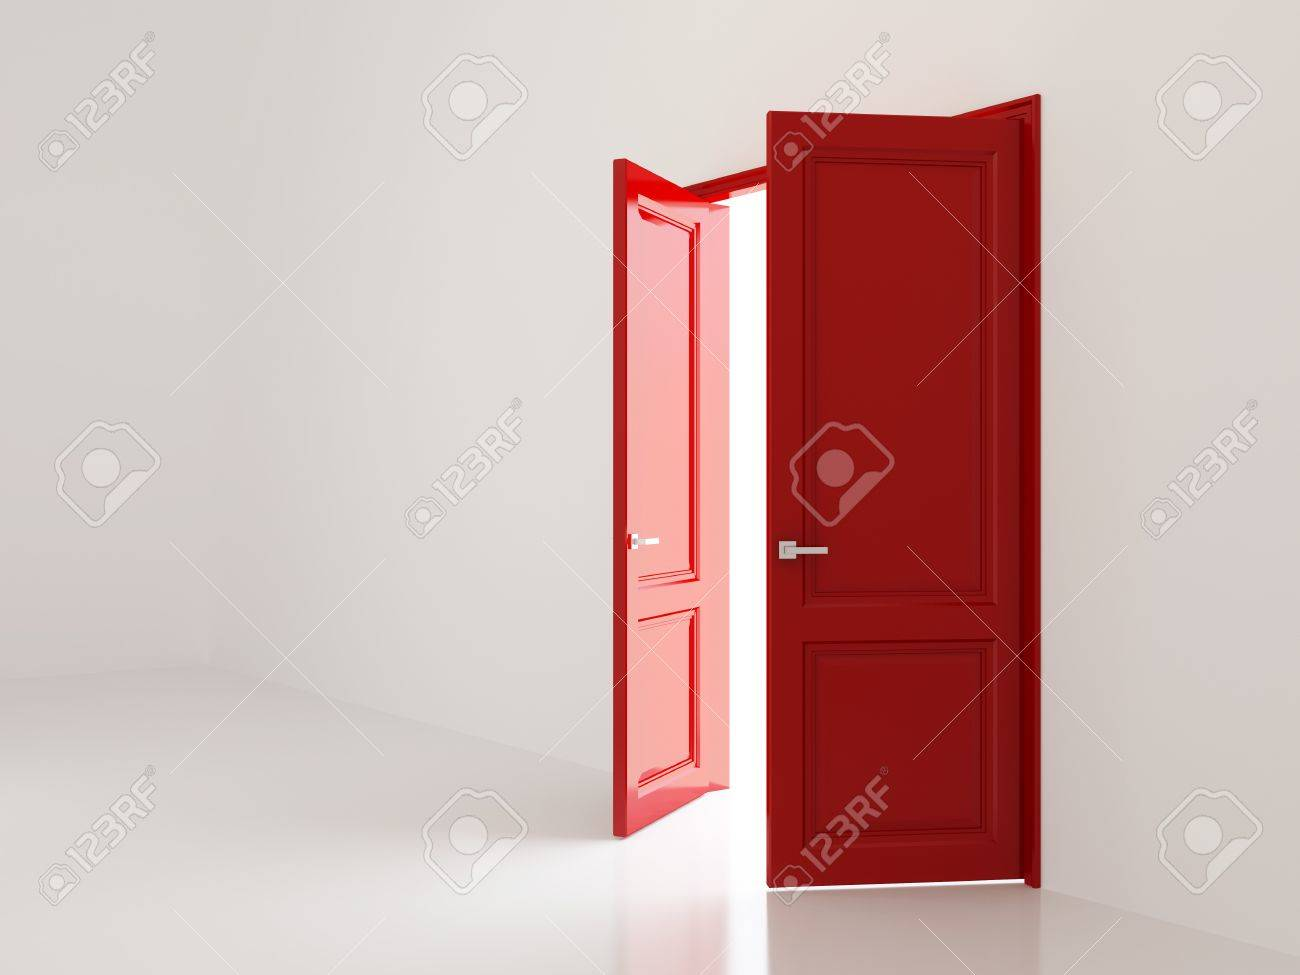 Interior and open doors Stock Photo - 12848054